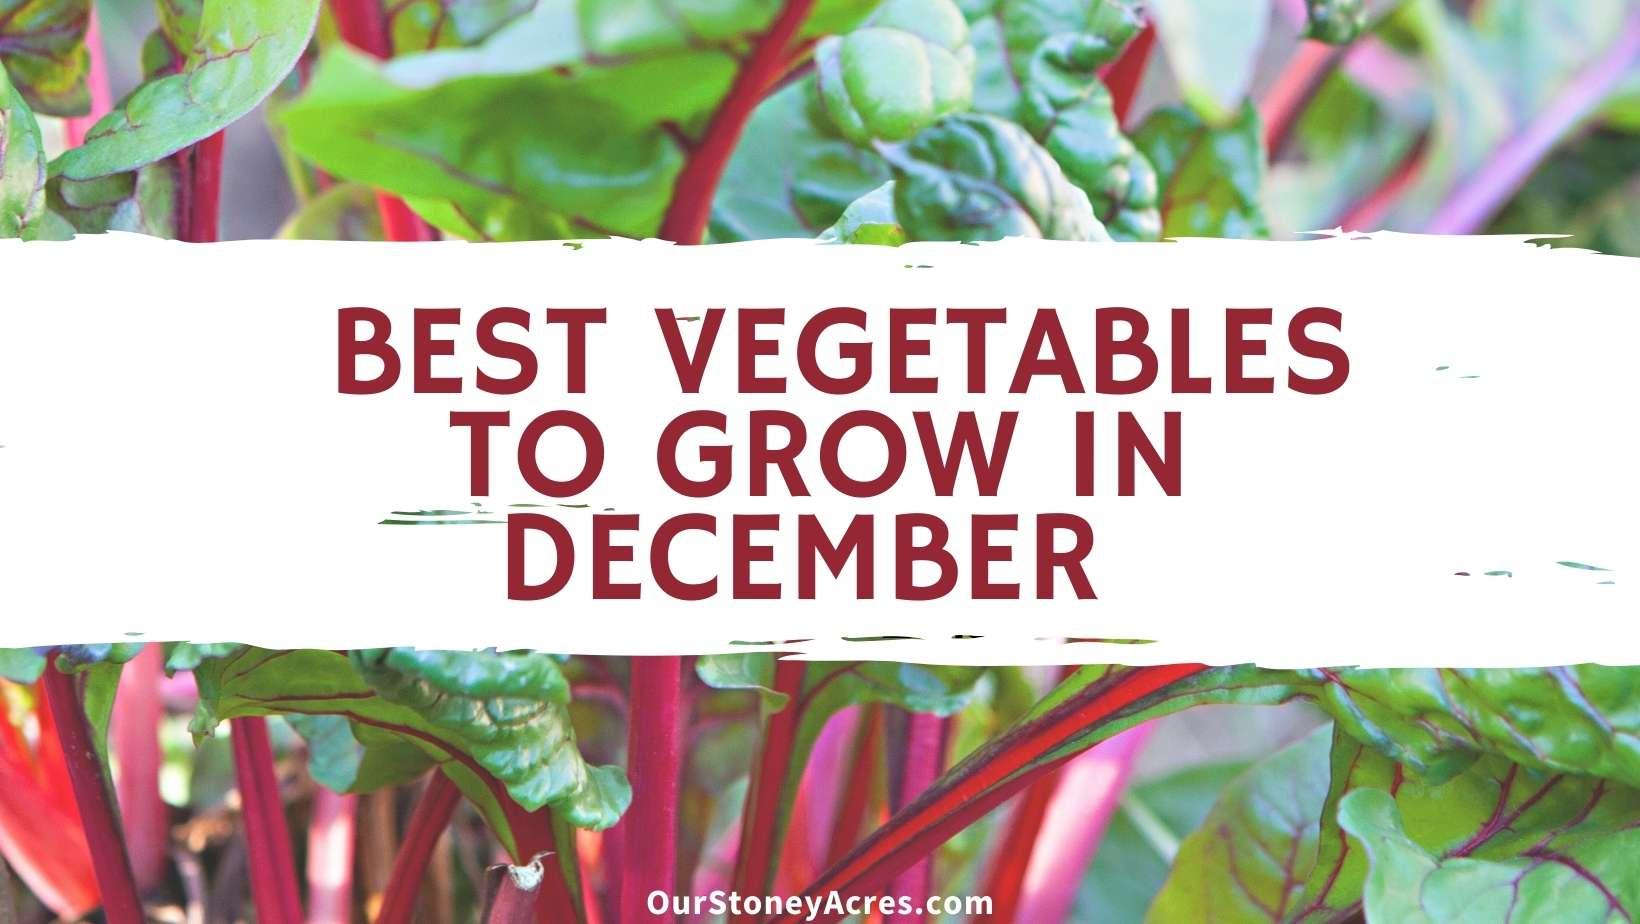 Best Vegetables to Grow in December